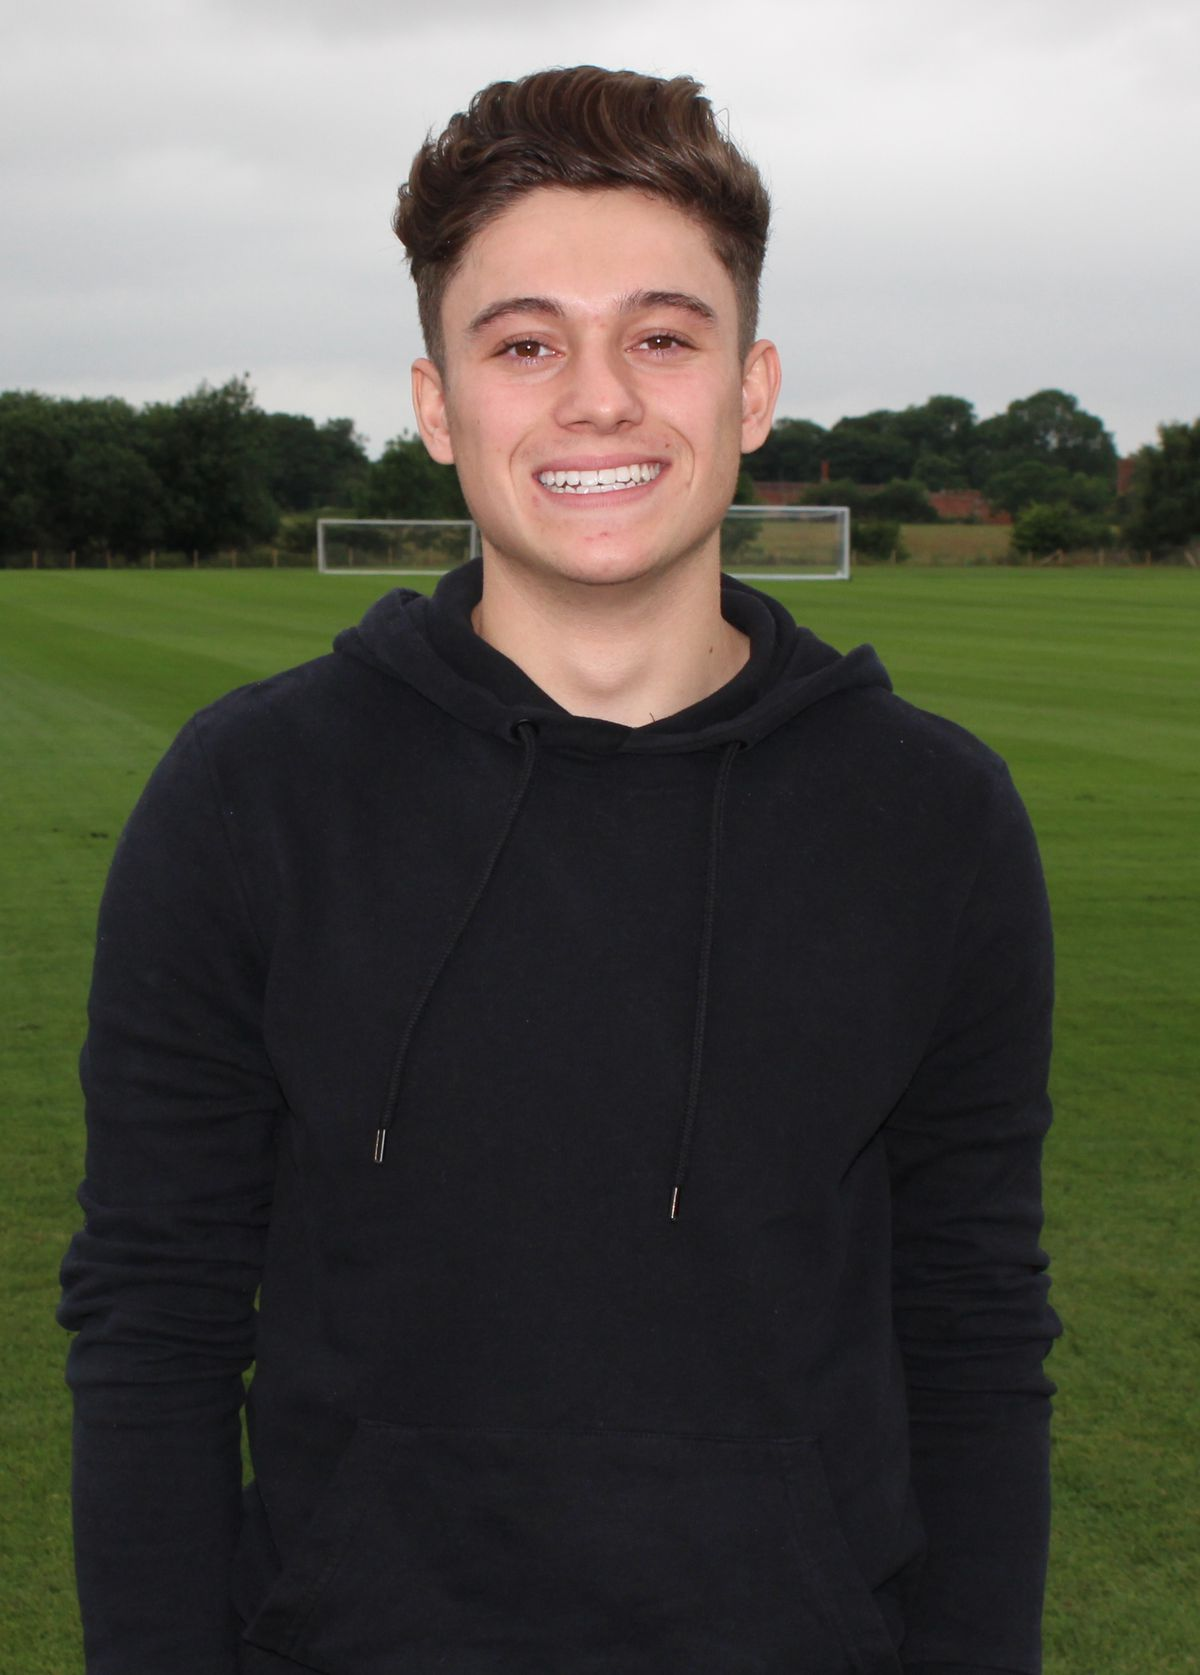 Daniel James checks in at Shrewsbury